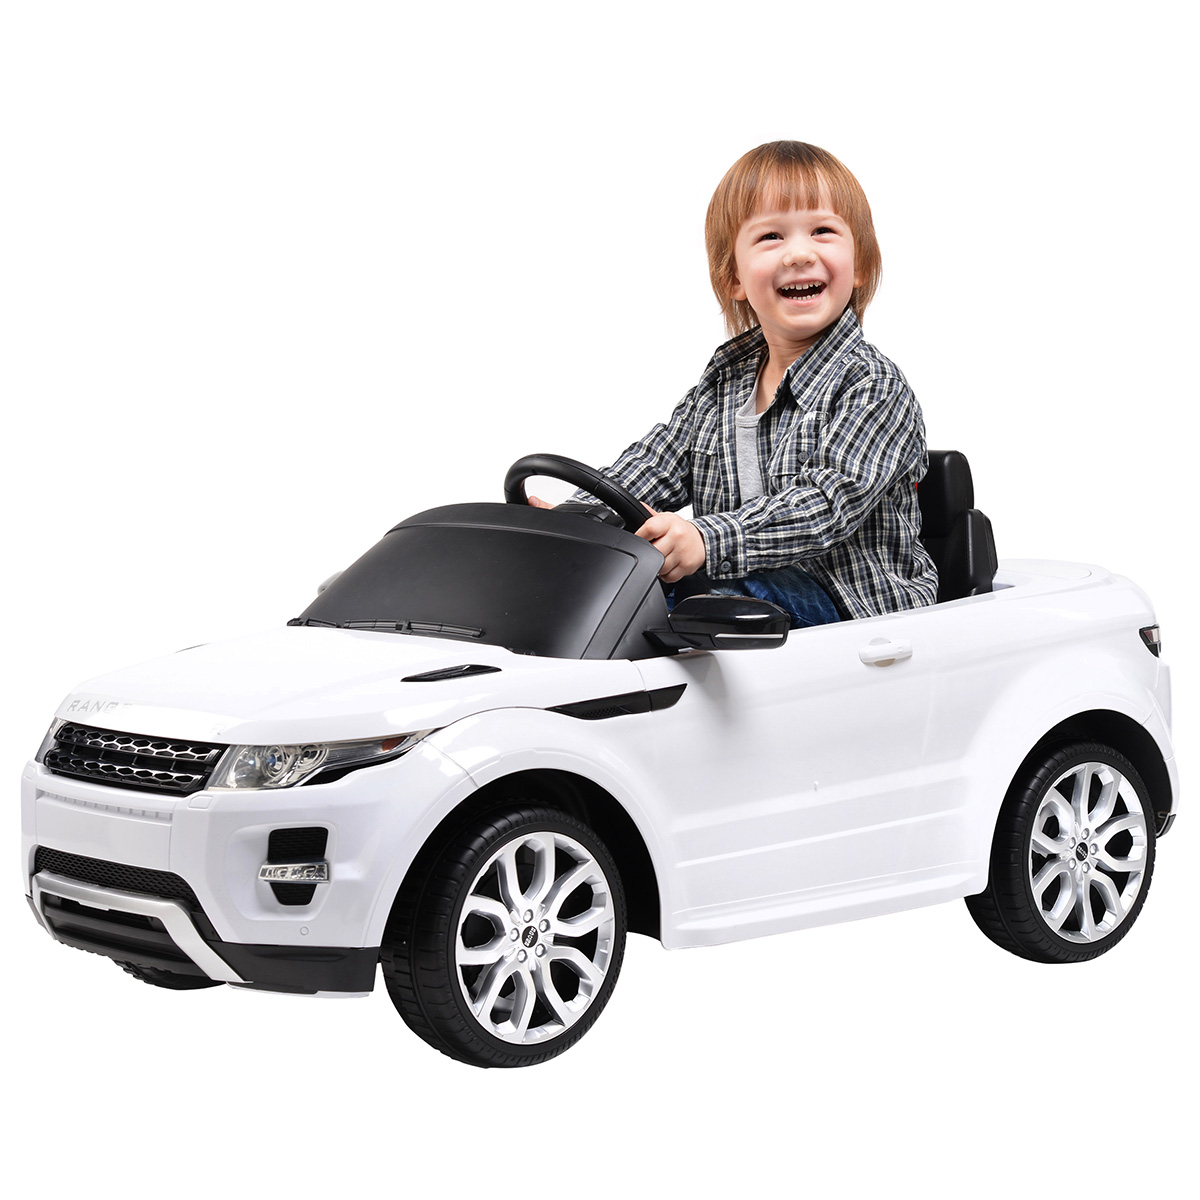 Range Rover Evoque Licensed Childrens Kids Ride On Electric